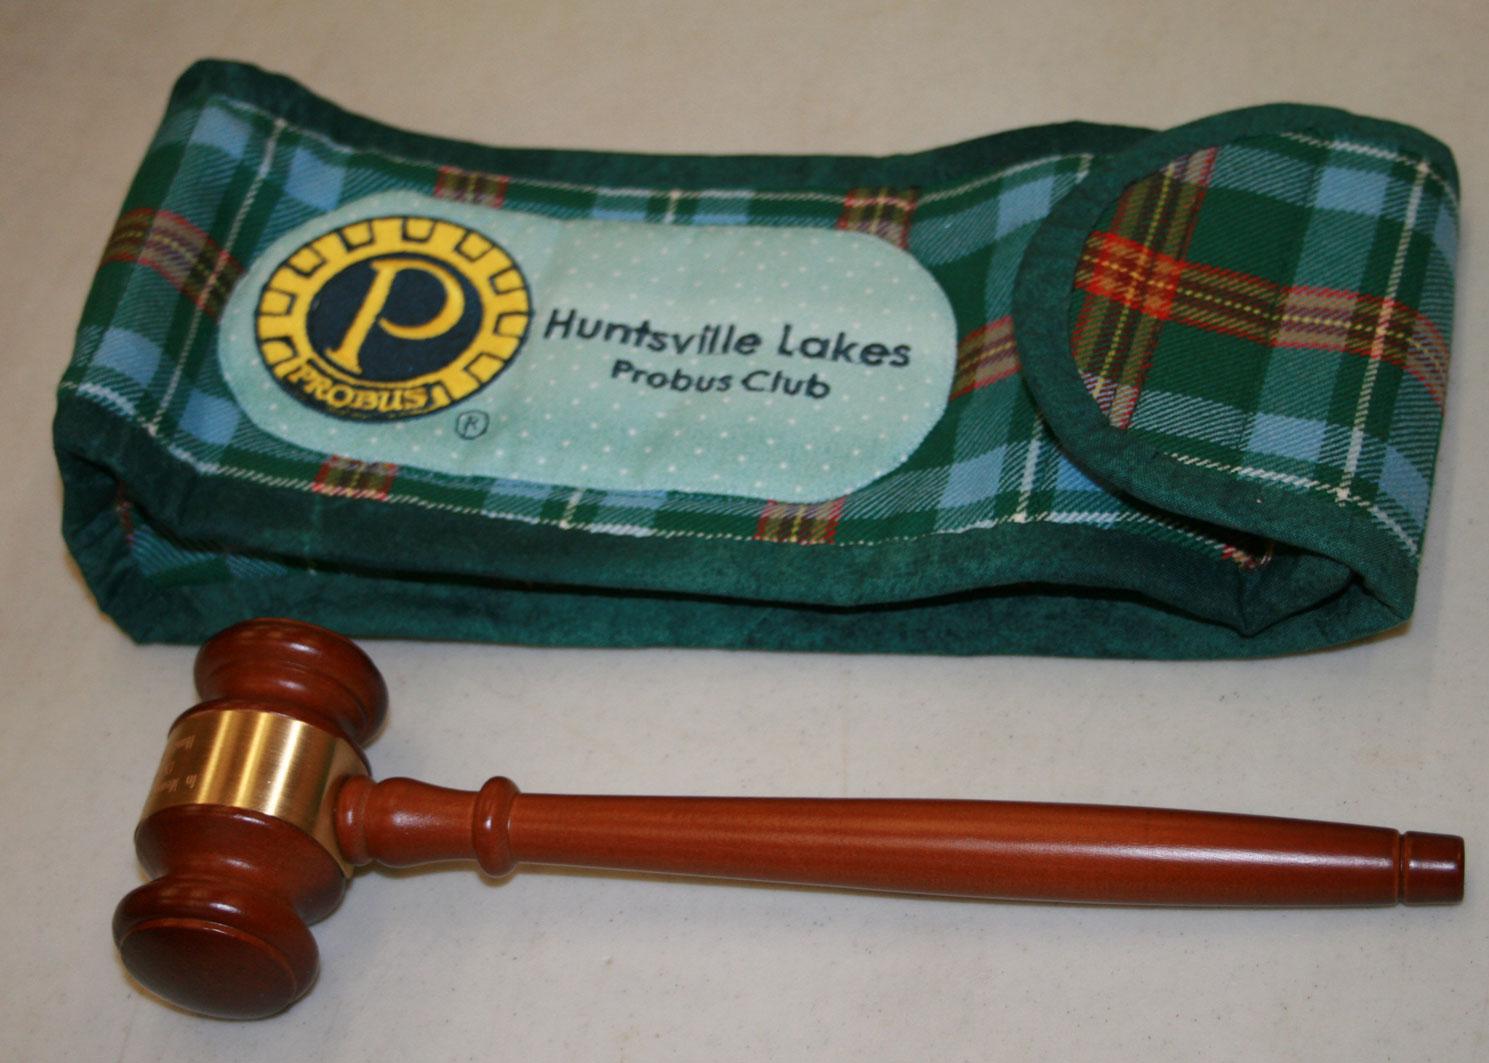 Huntsville Lakes